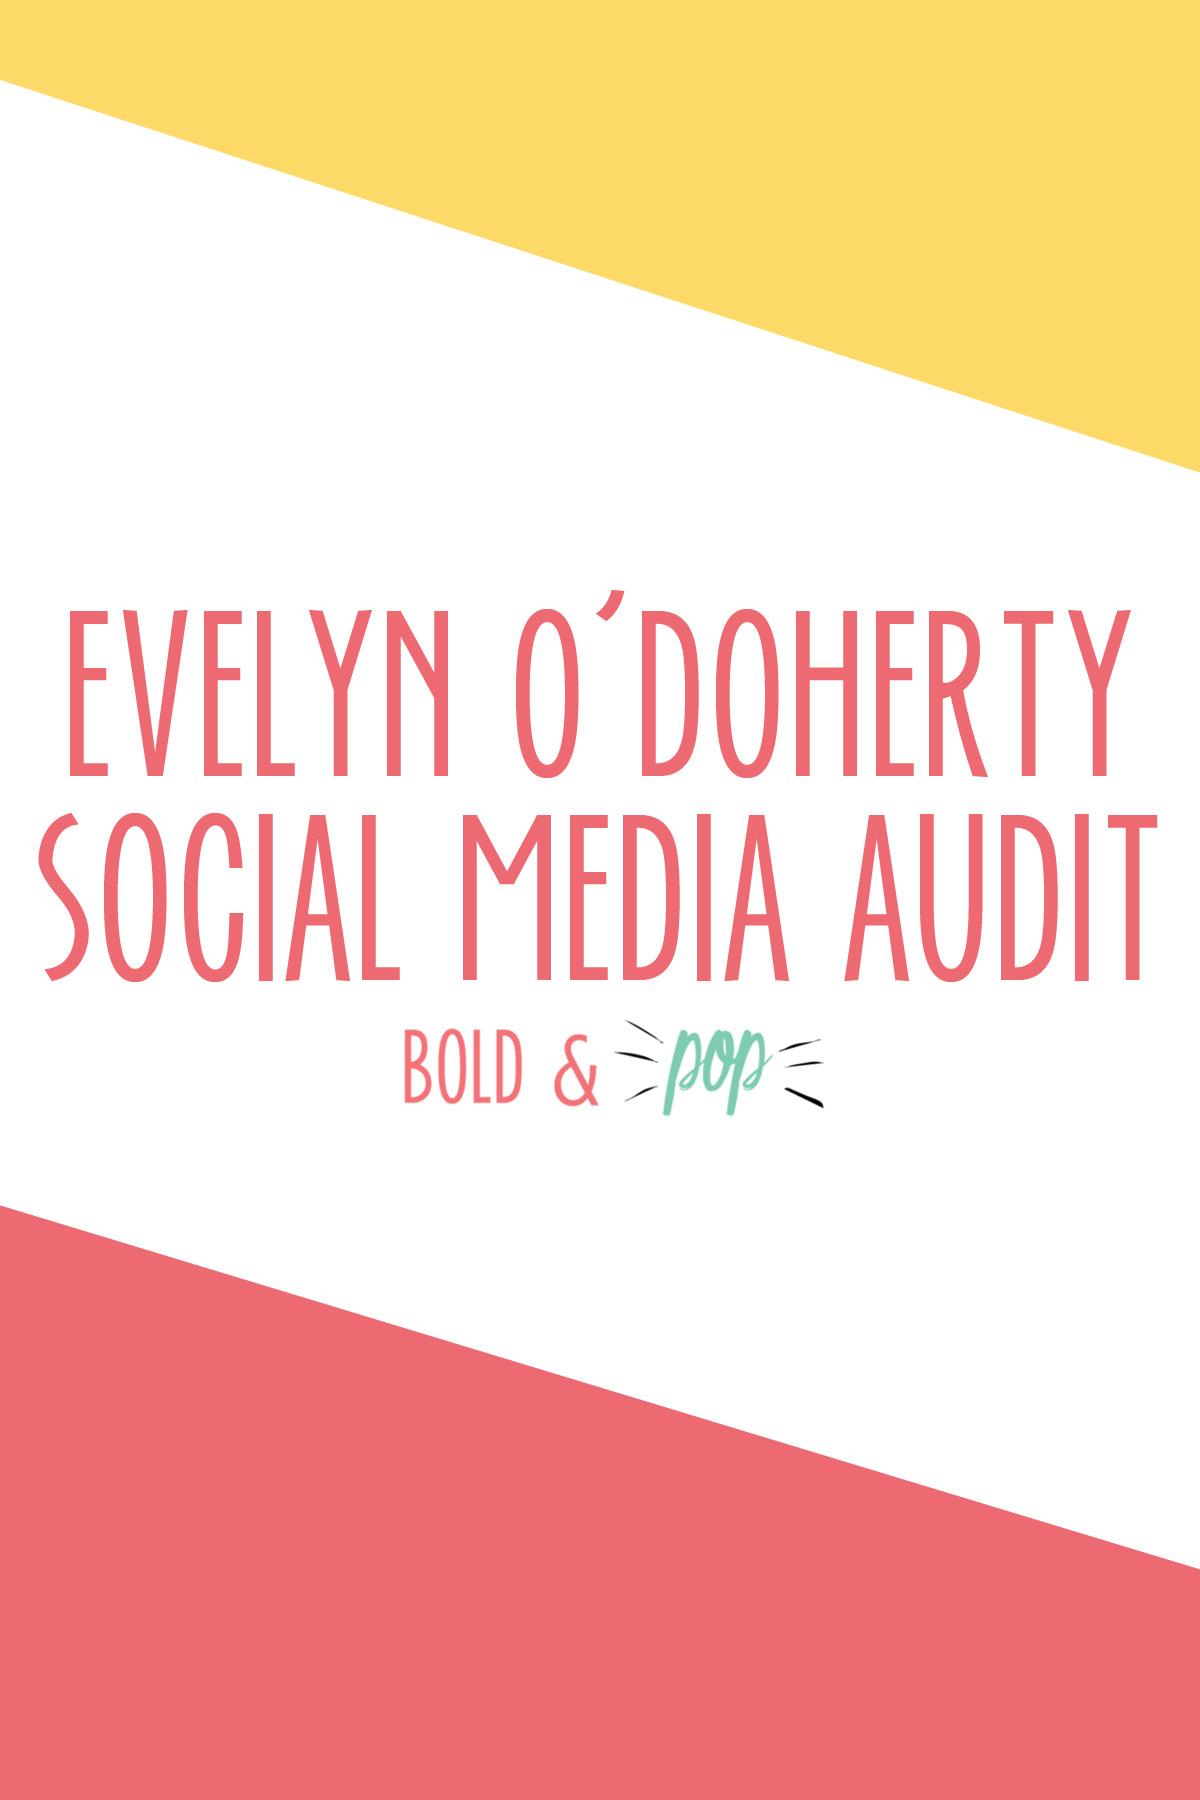 Bold & Pop : Evelyn O'Doherty Social Media Audit